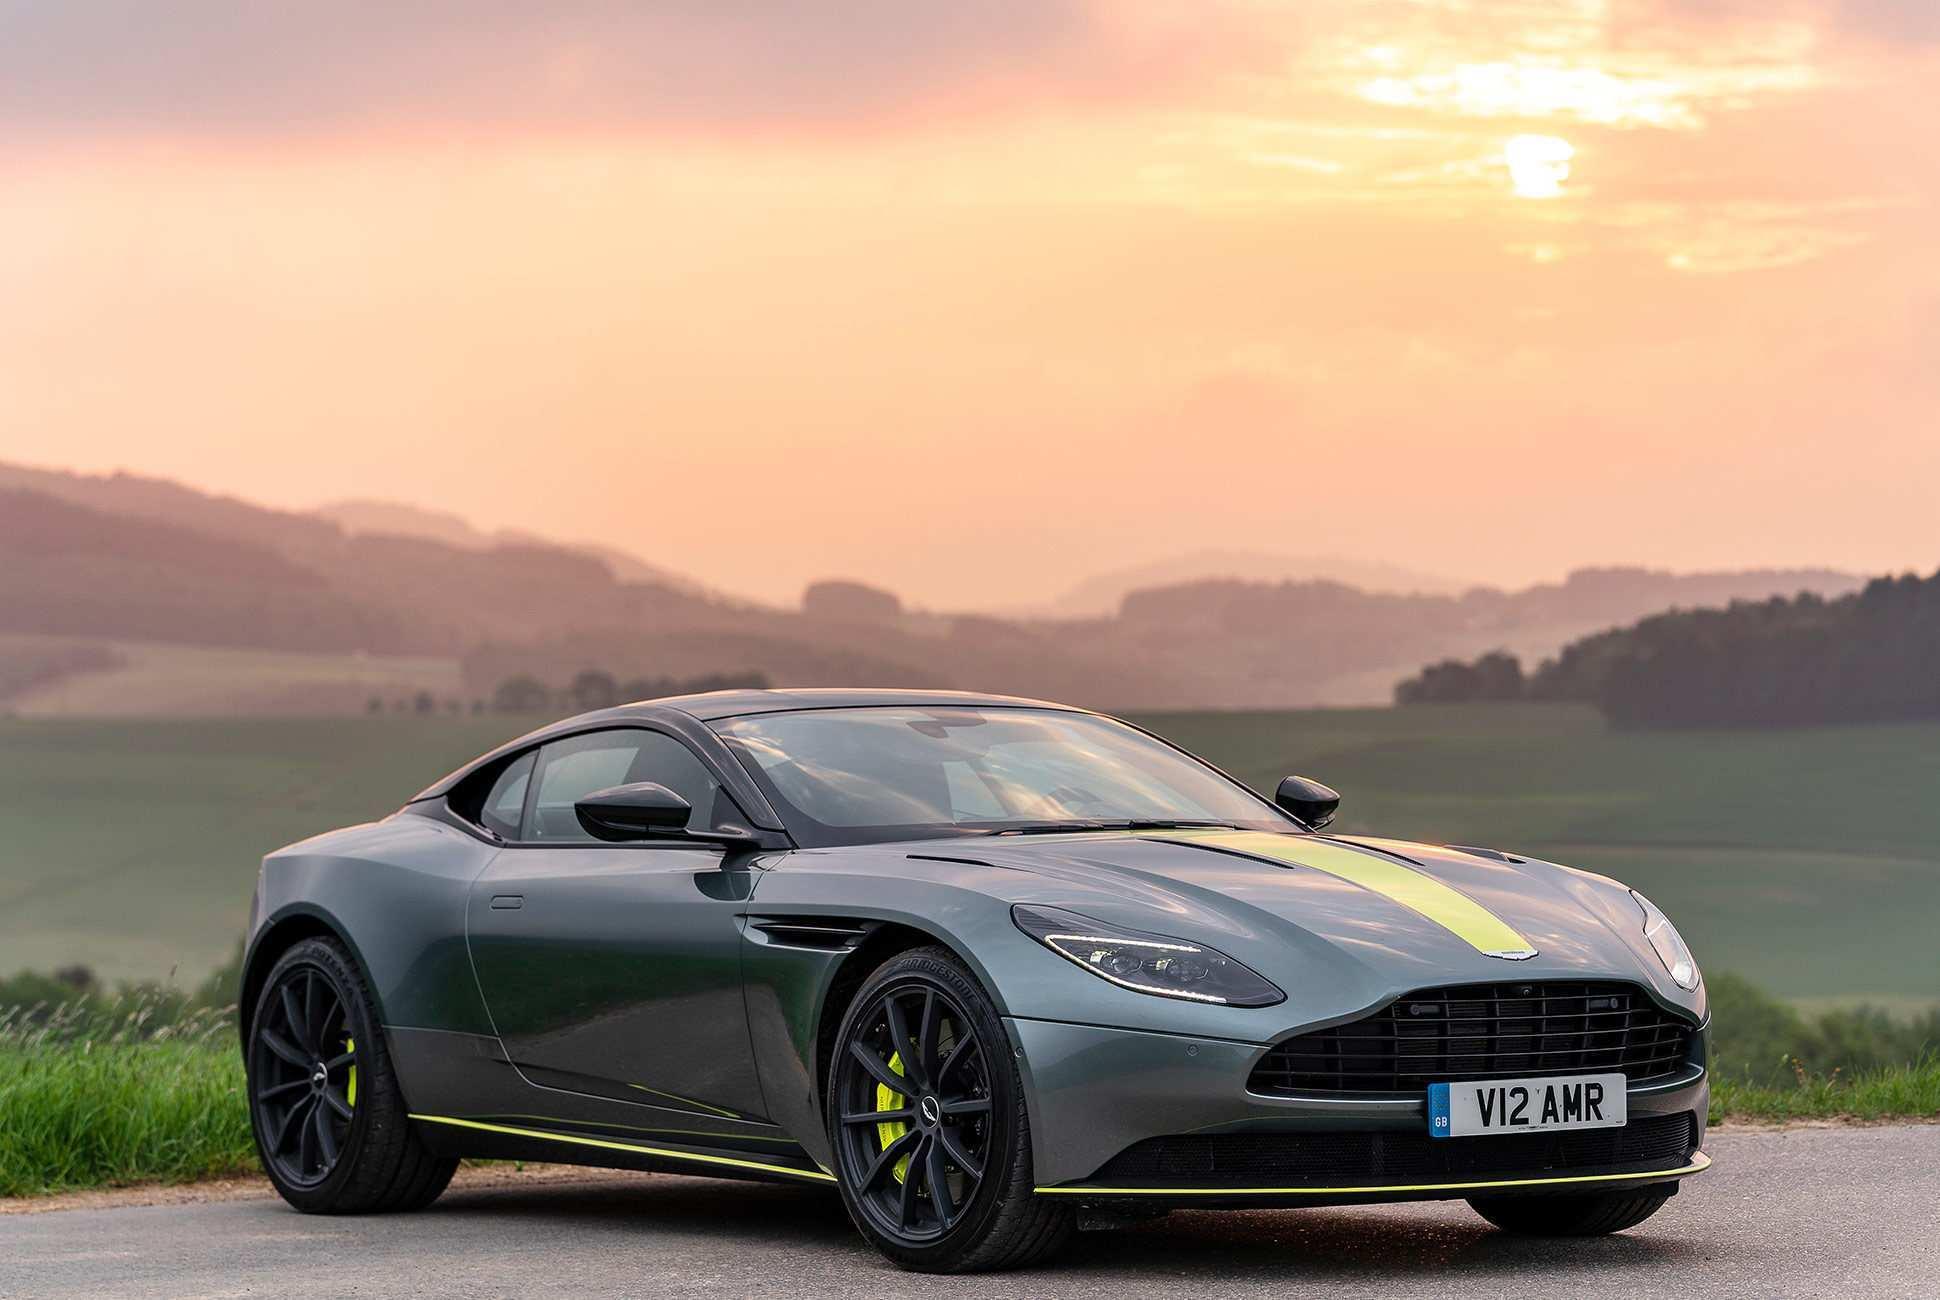 81 New 2019 Aston Martin Db11 Reviews for 2019 Aston Martin Db11